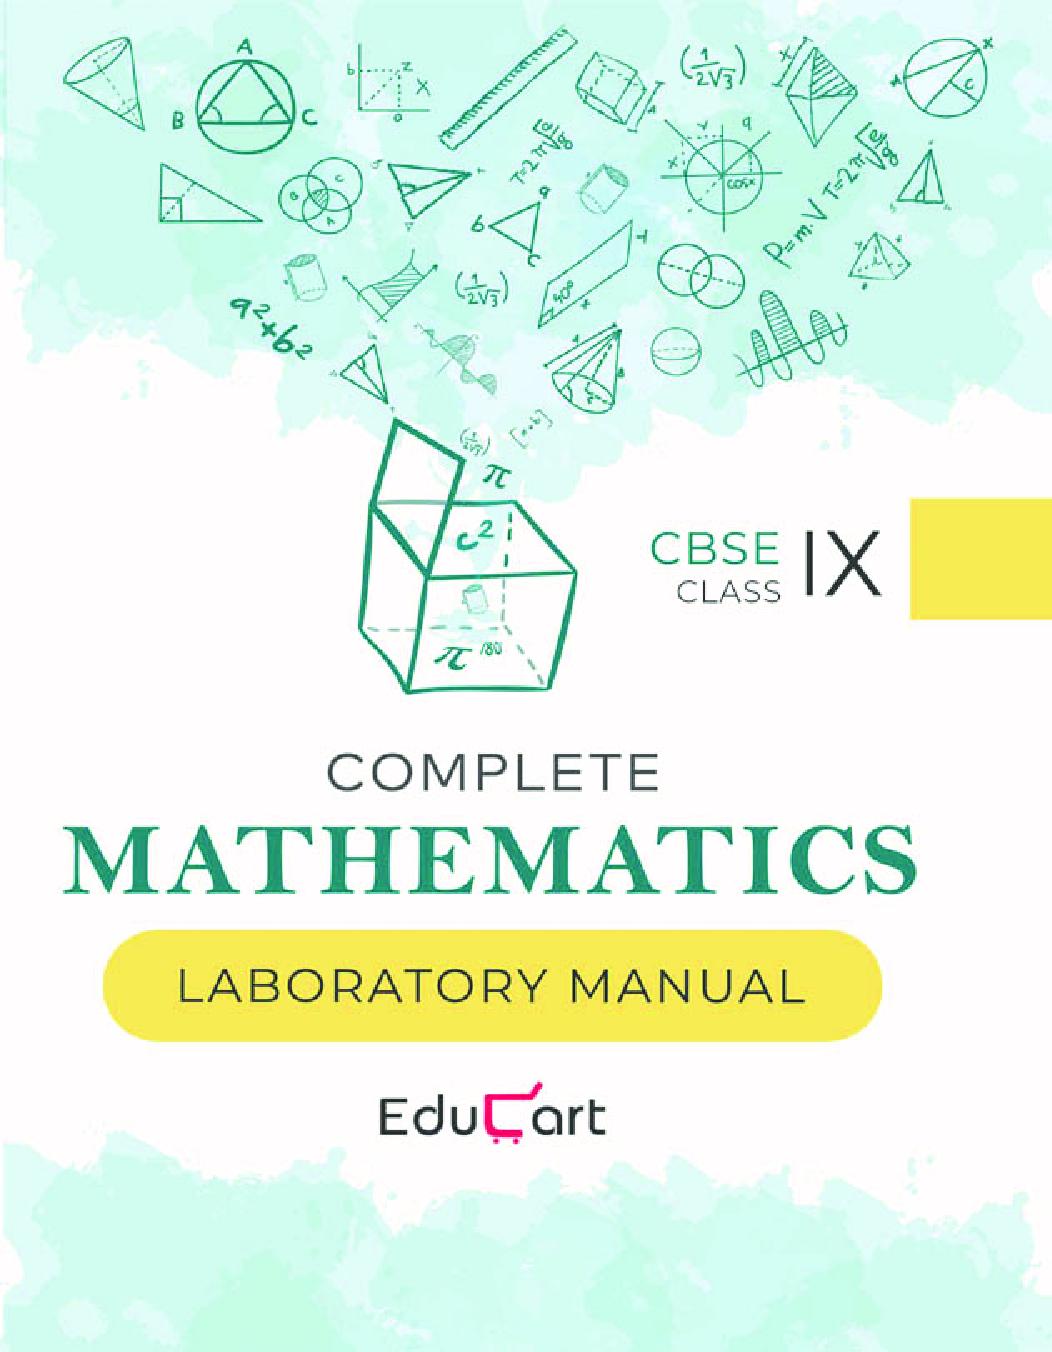 Educart CBSE Complete Mathematics Laboratory Manual For Class - IX - Page 1